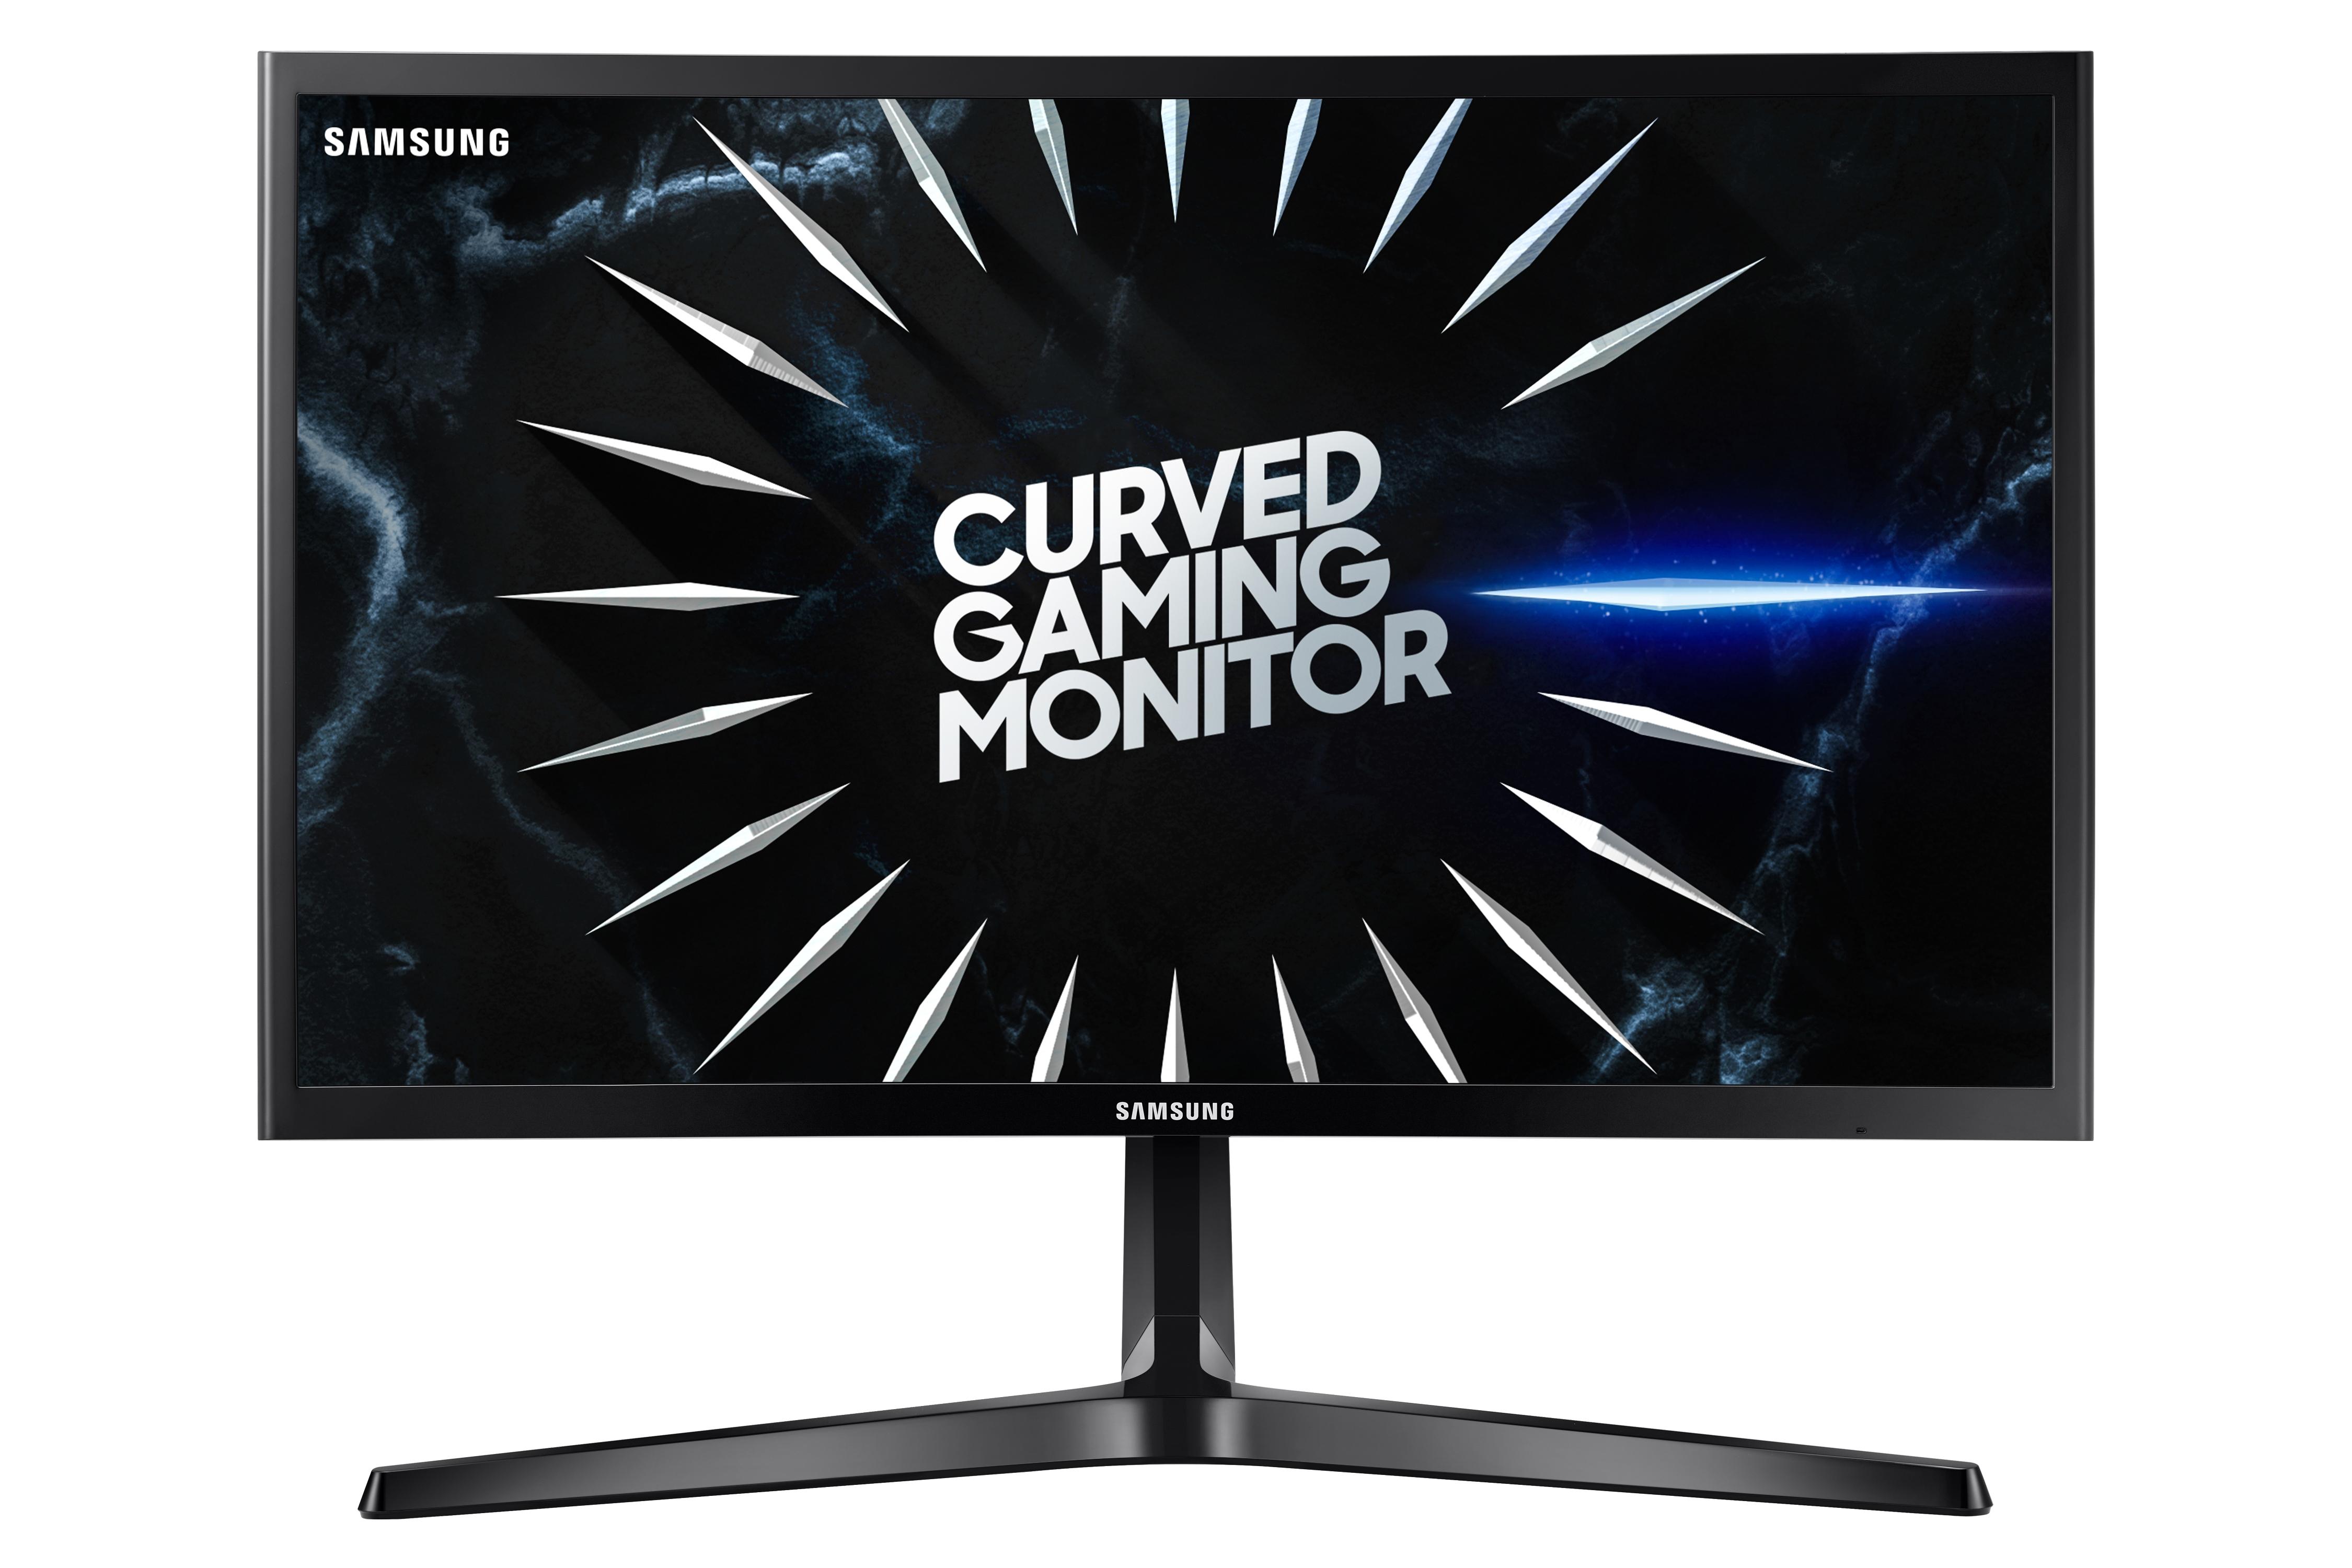 """Samsung 24"""" CRG5 Curved Gaming Monitor, Black"""